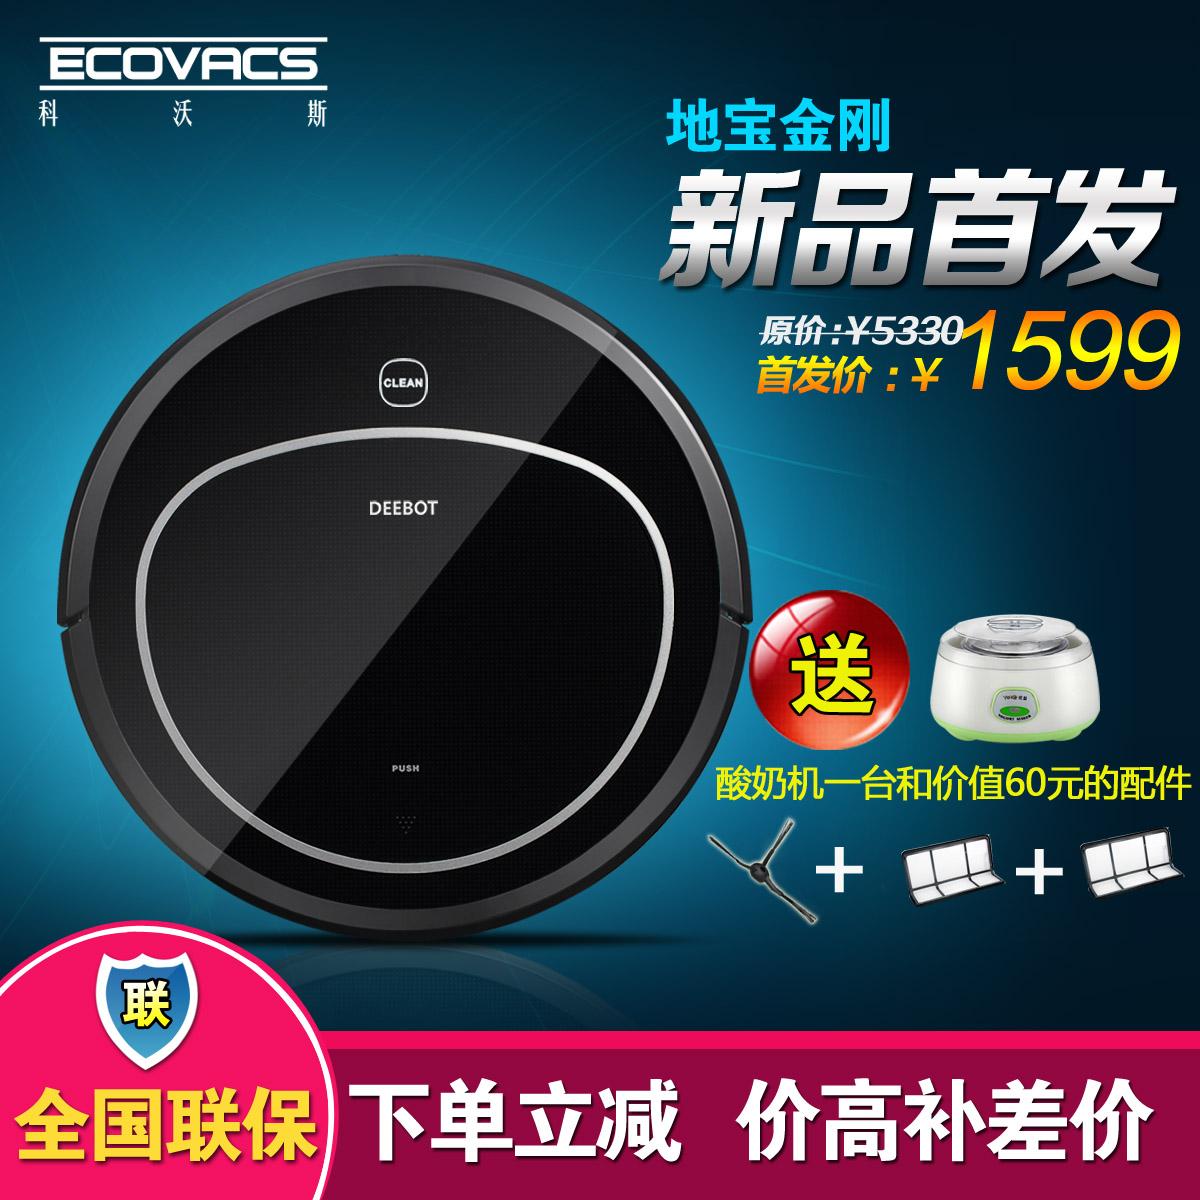 Ranunculaceae worsley kumgang cr130 home smart automatic robot vacuum cleaner(China (Mainland))